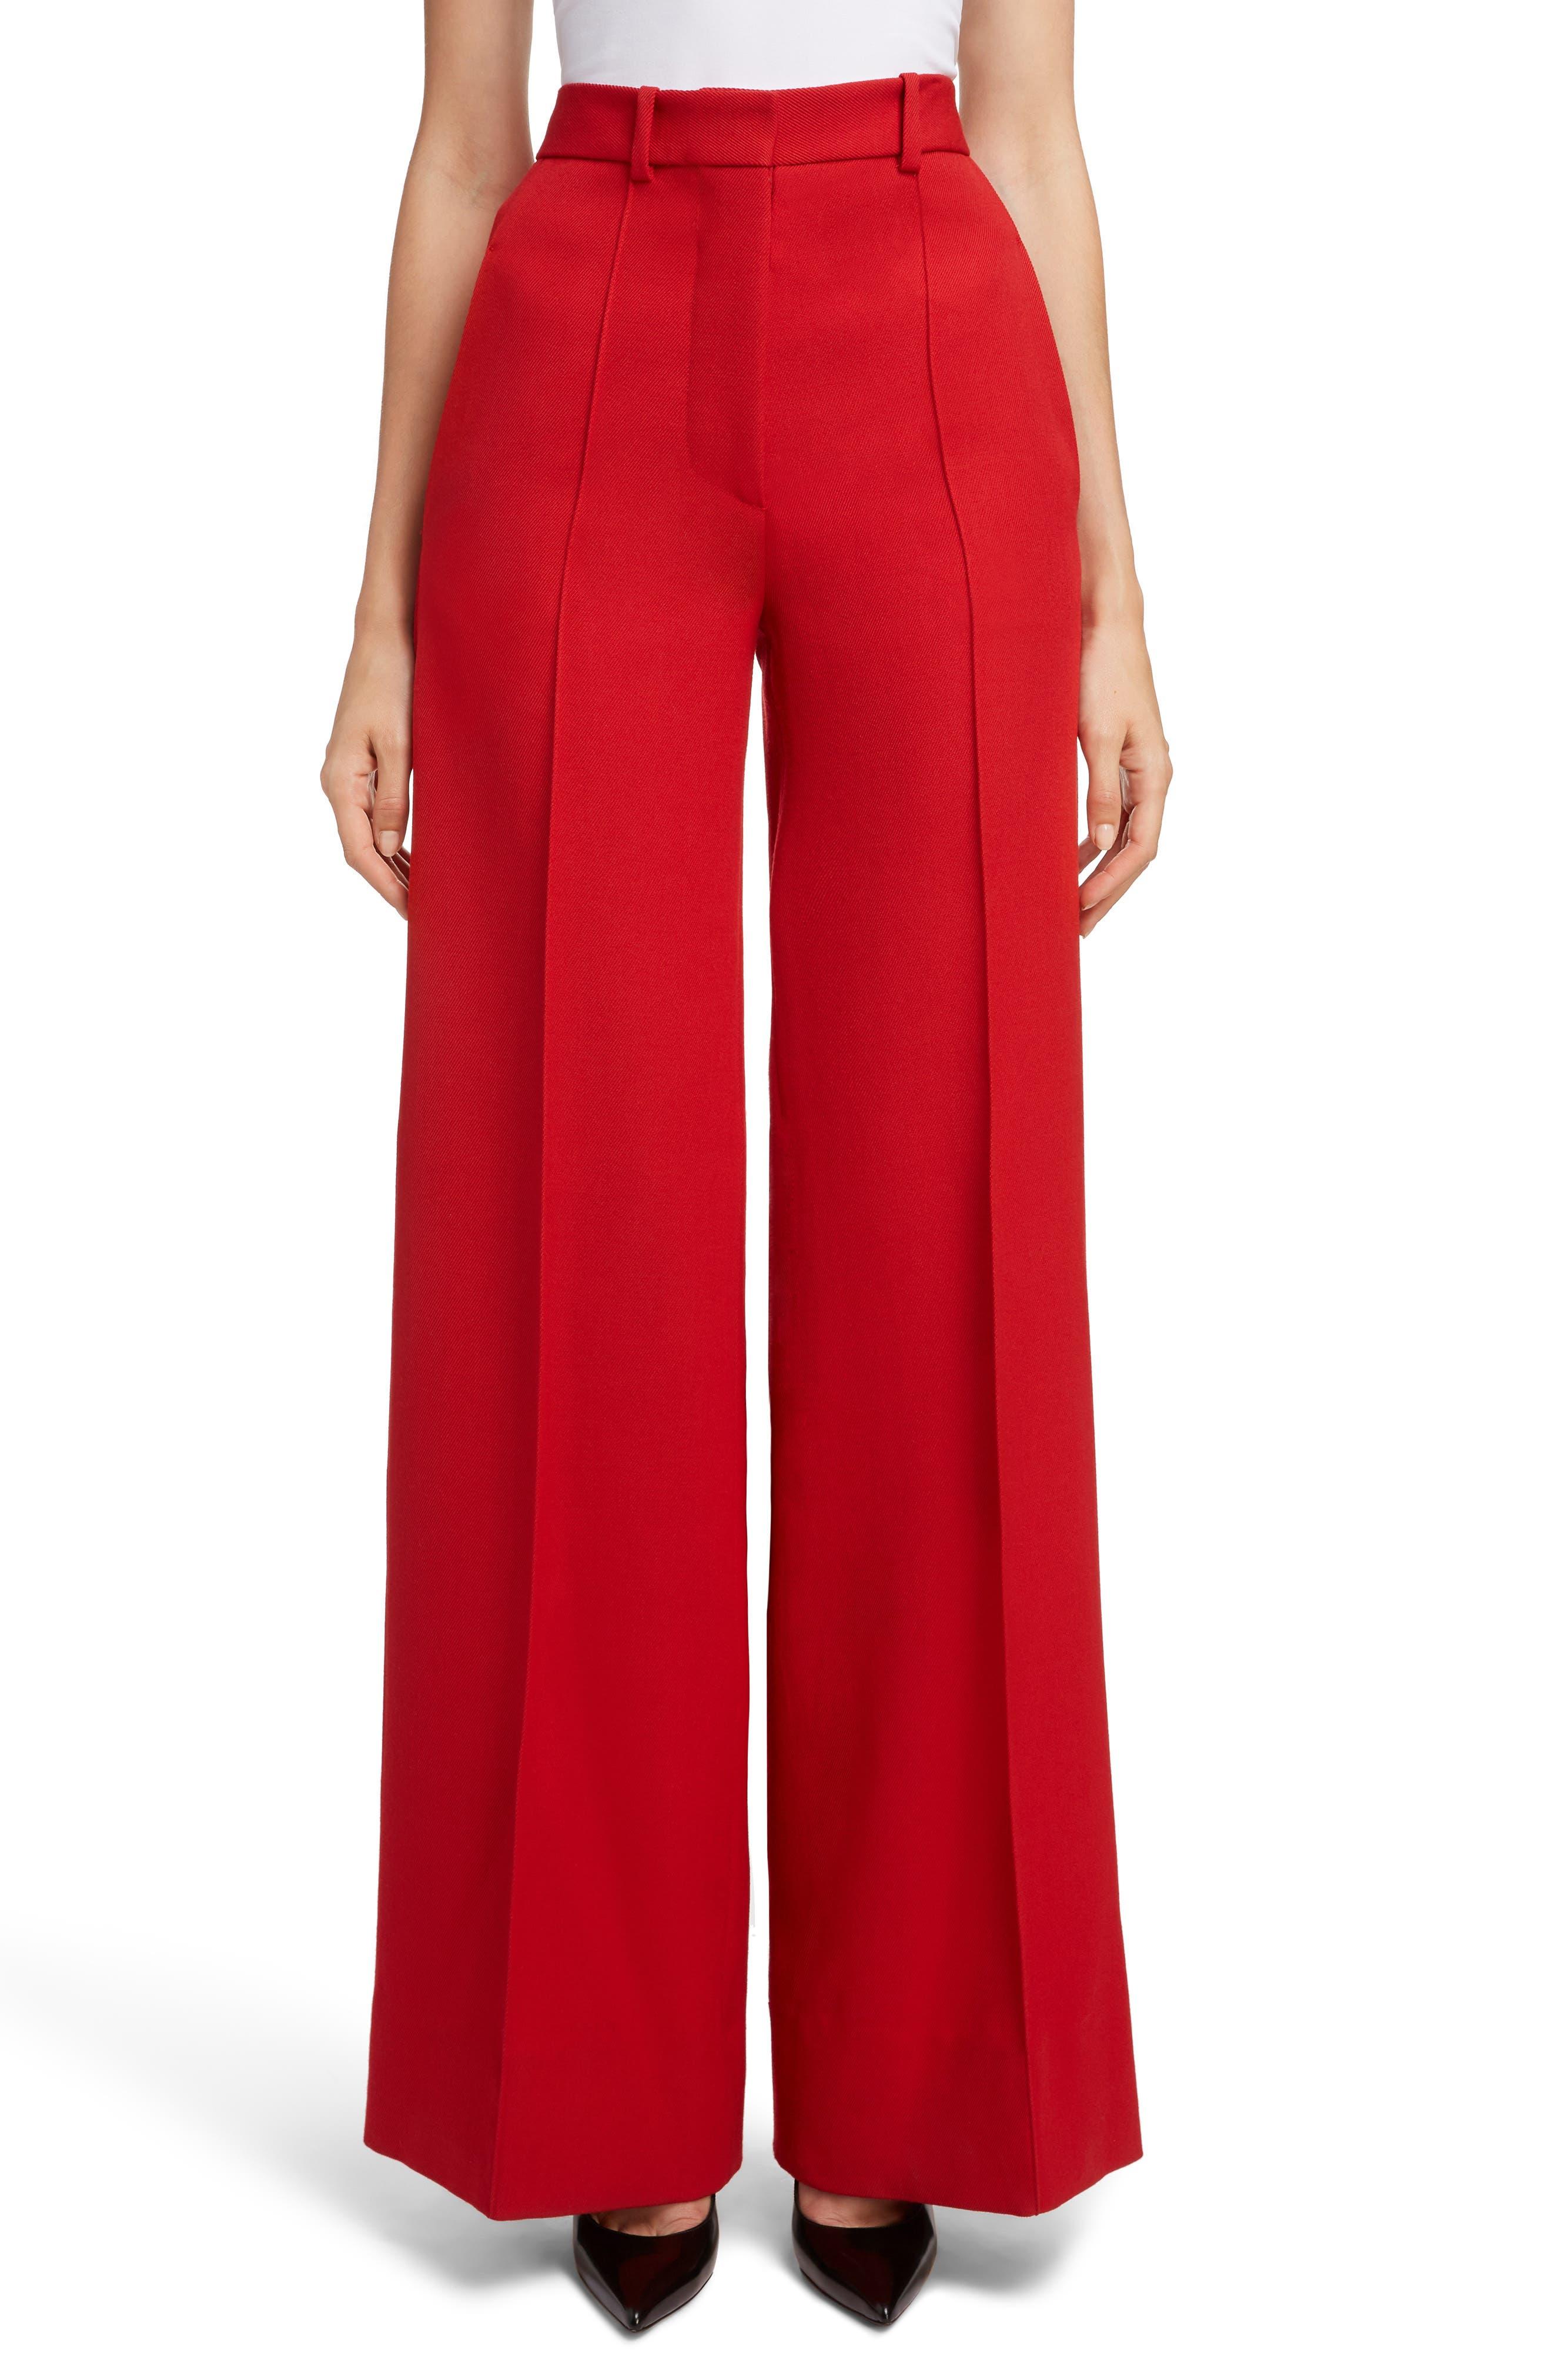 VICTORIA BECKHAM, High Waist Wool Pants, Main thumbnail 1, color, RED